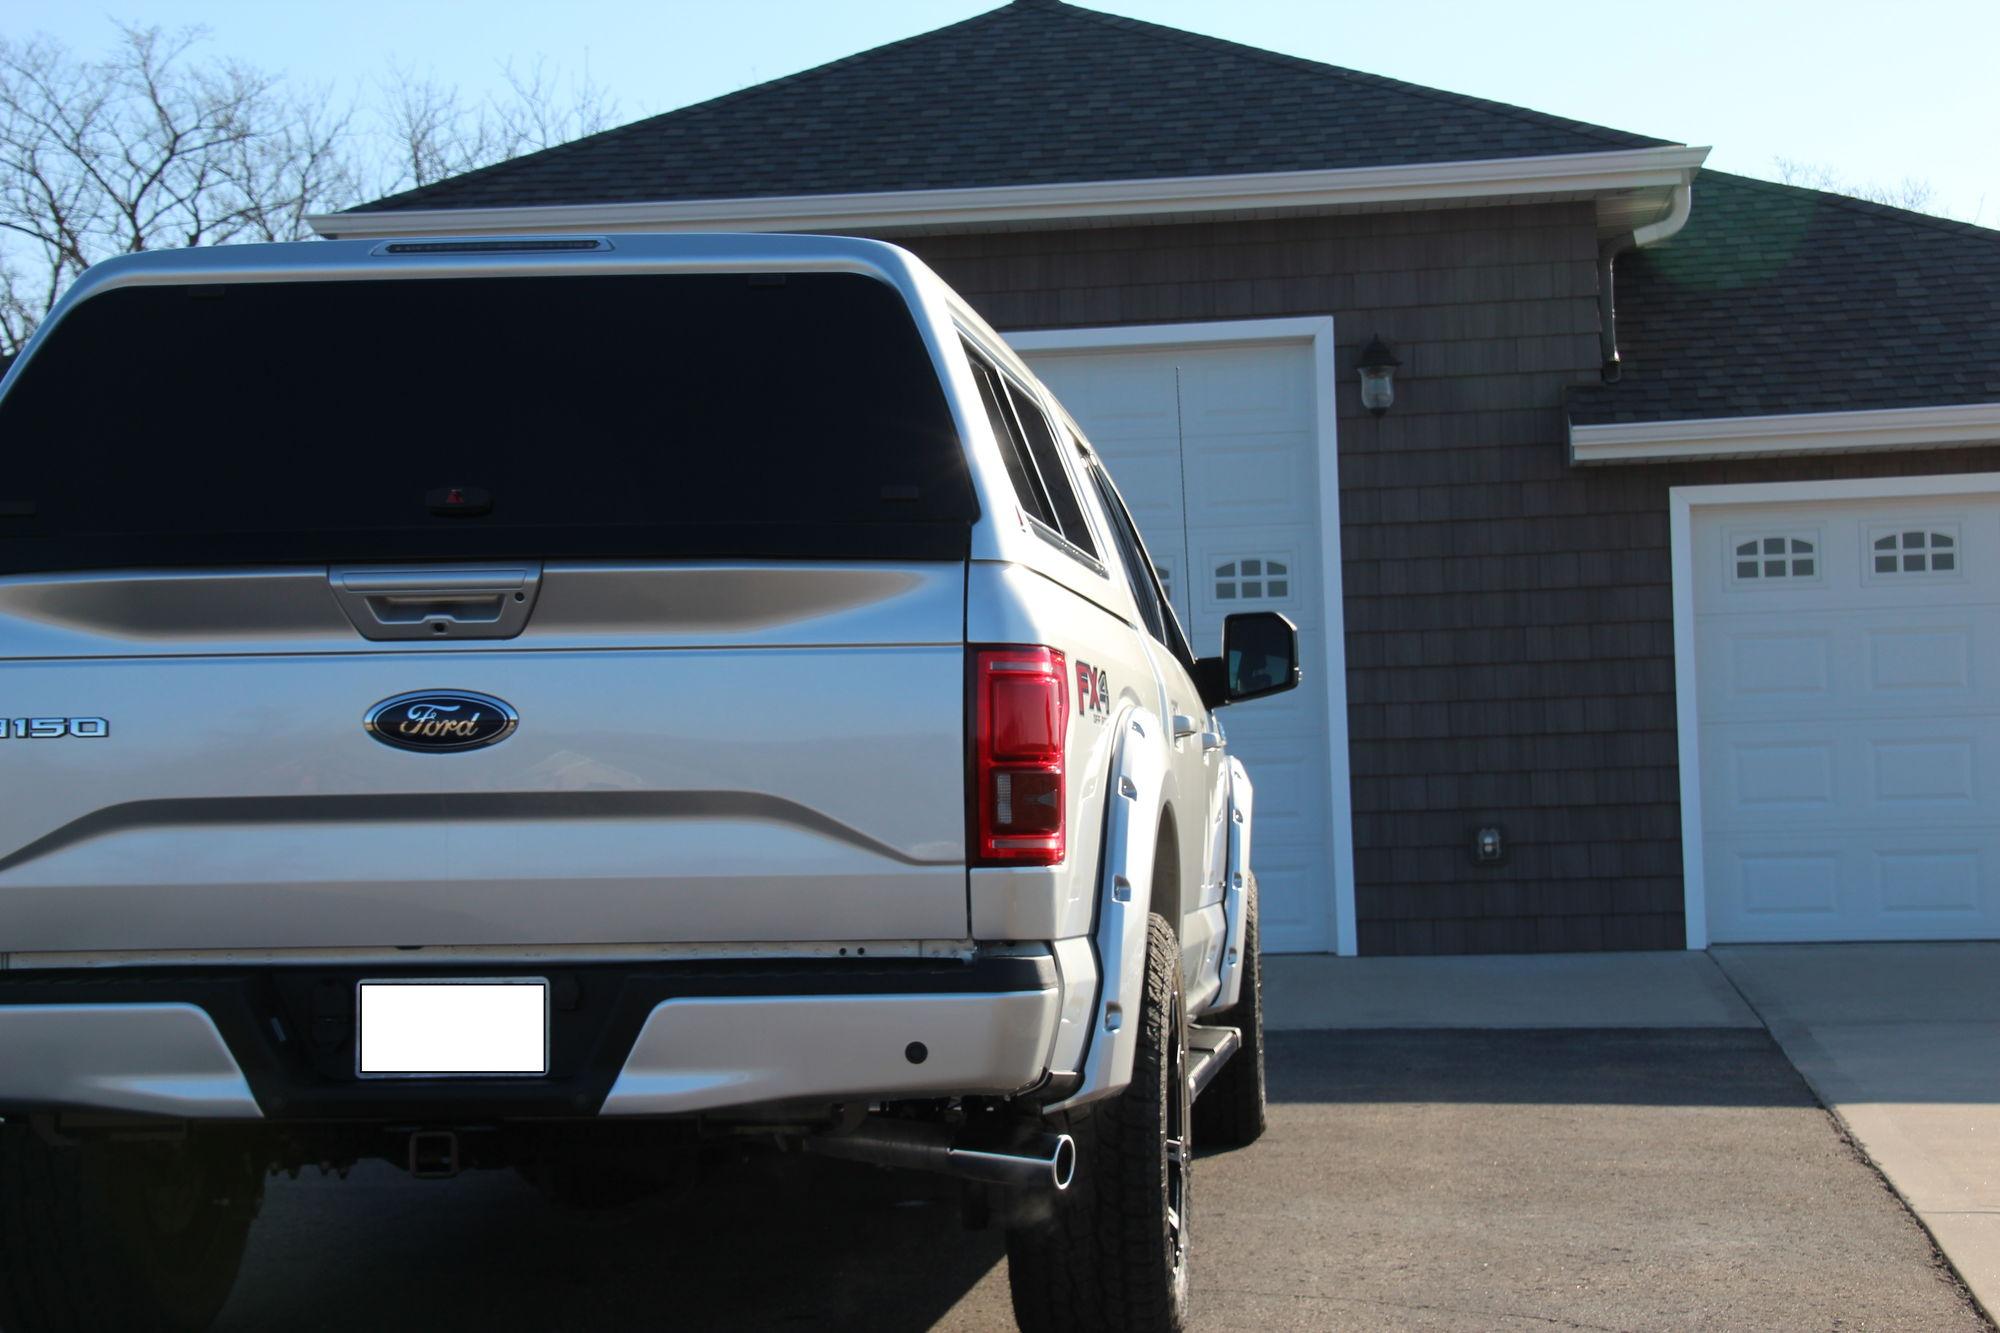 gotstocks Silver Lariat Sport Build - Ford F150 Forum - Community of ...